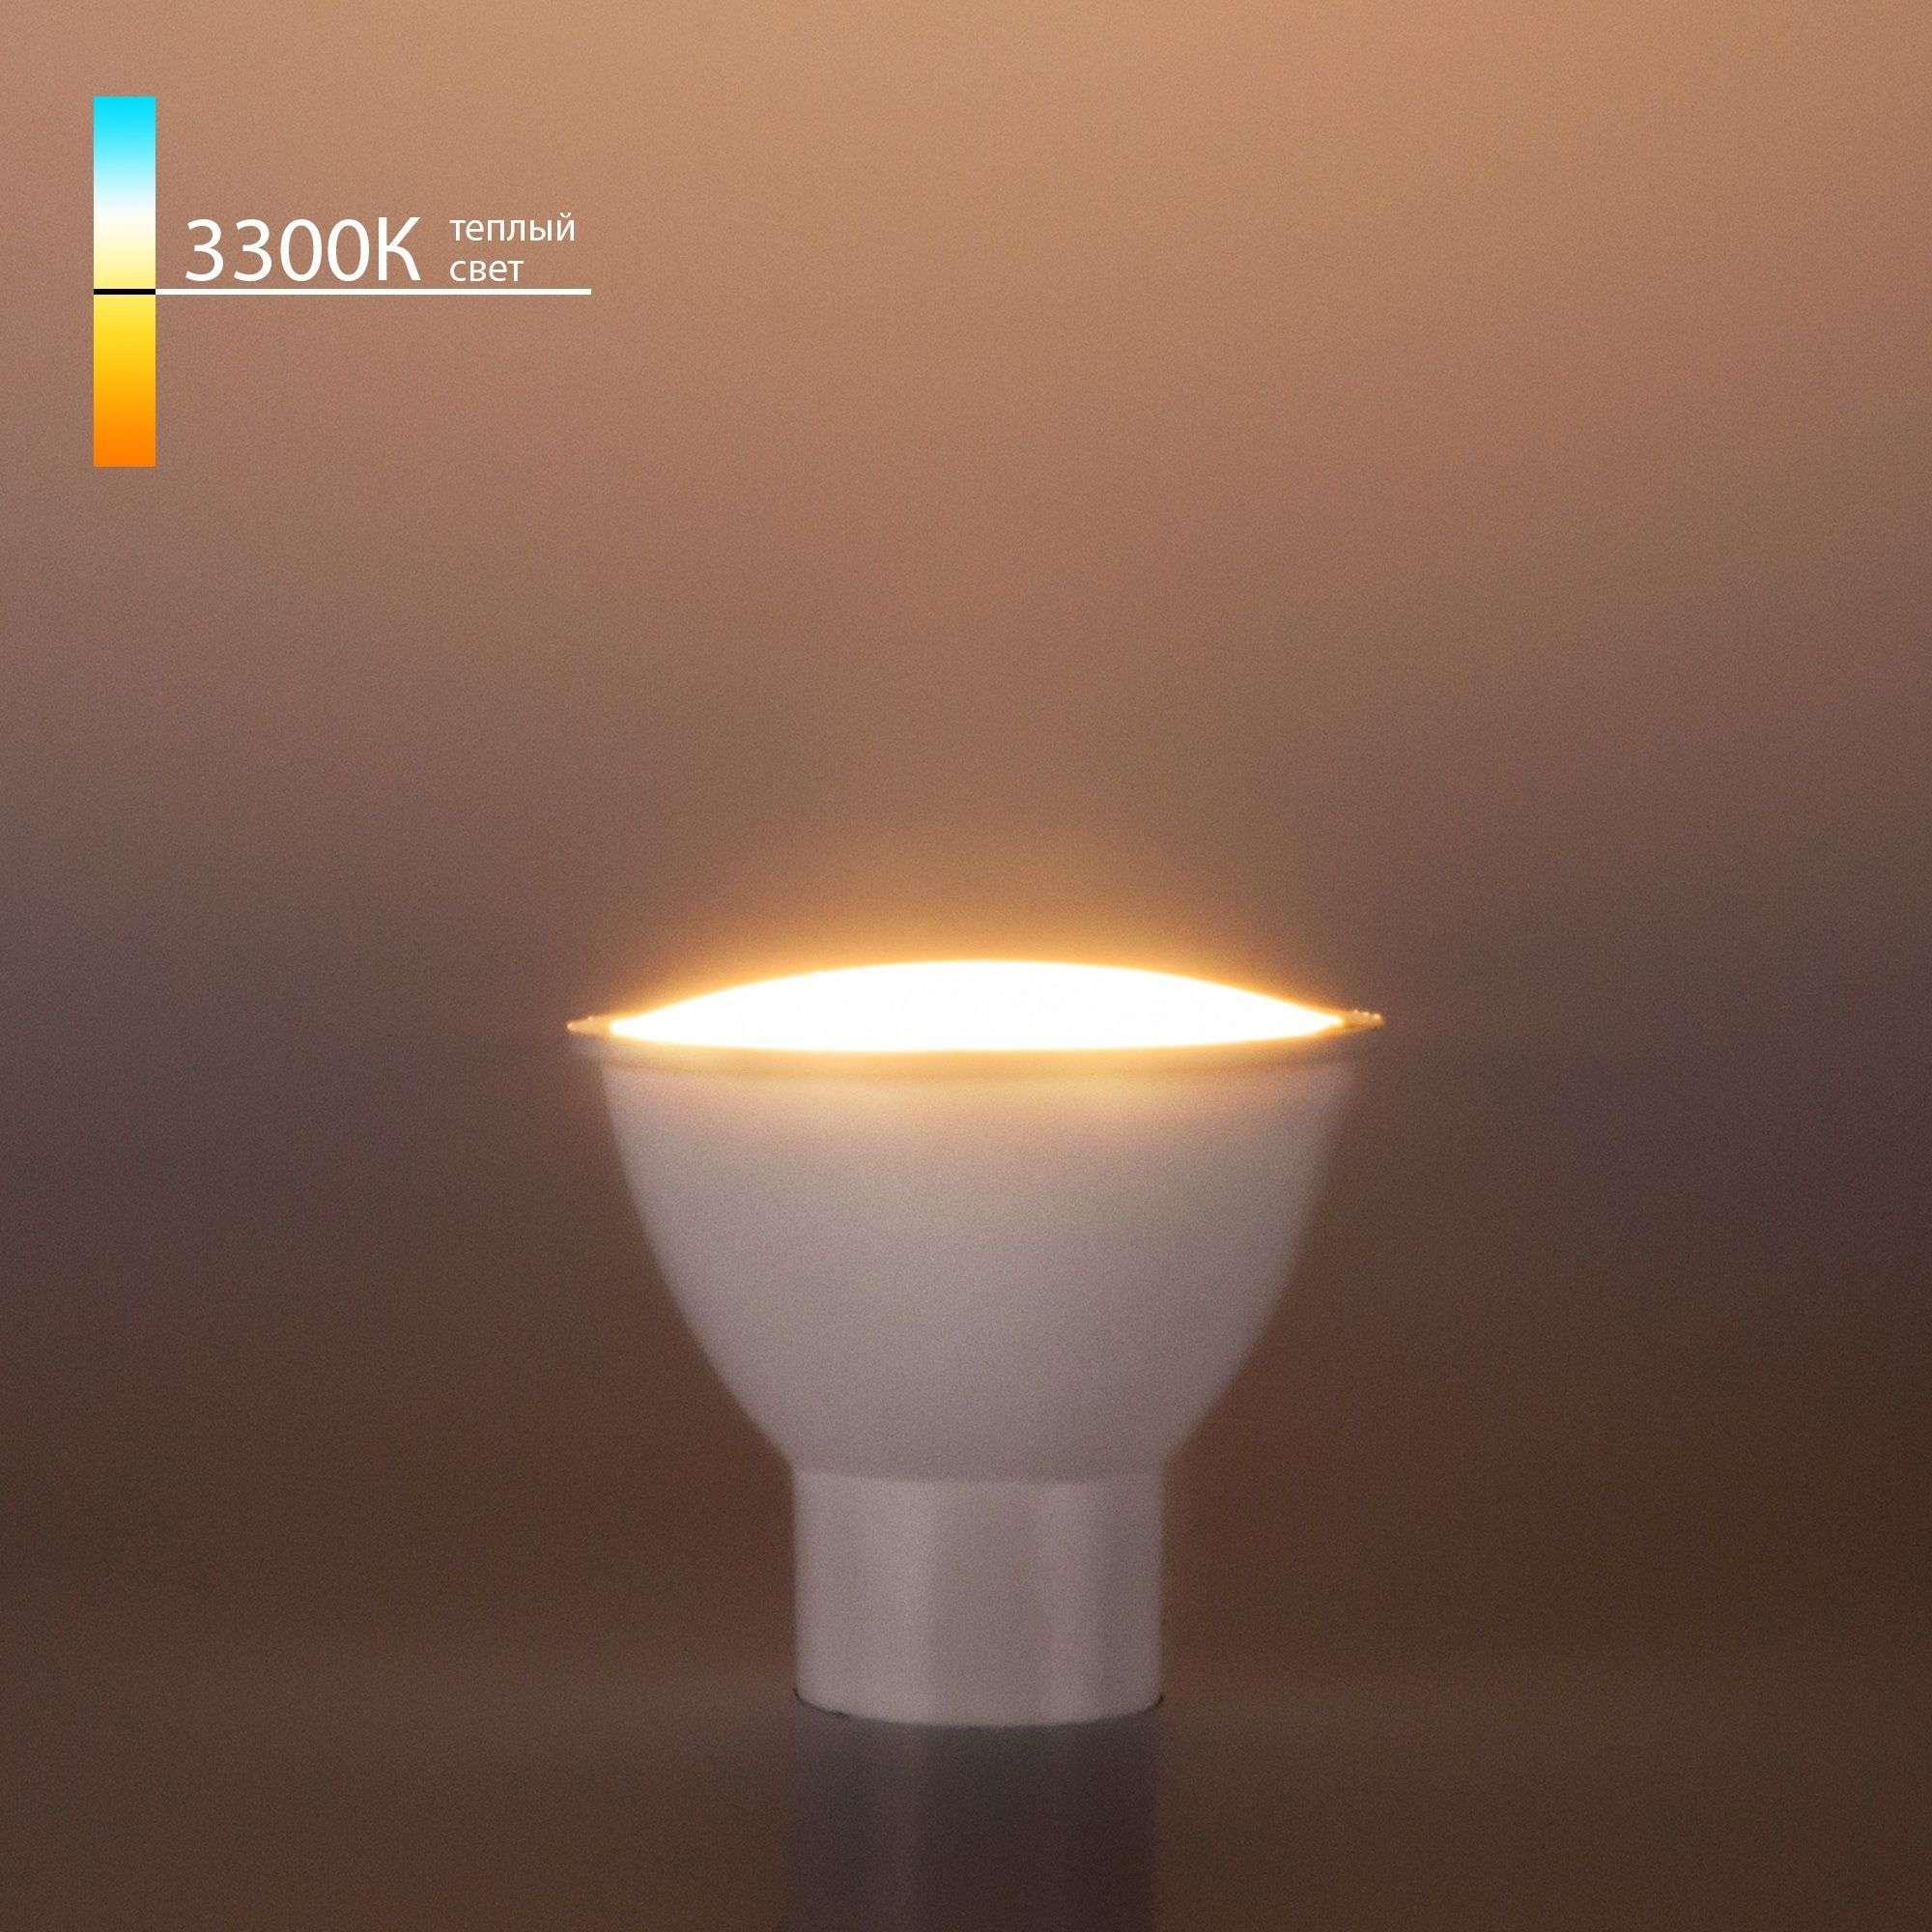 Cветодиодная лампа JCDR 5W 3300K GU10 GU10 LED 5W 3300K